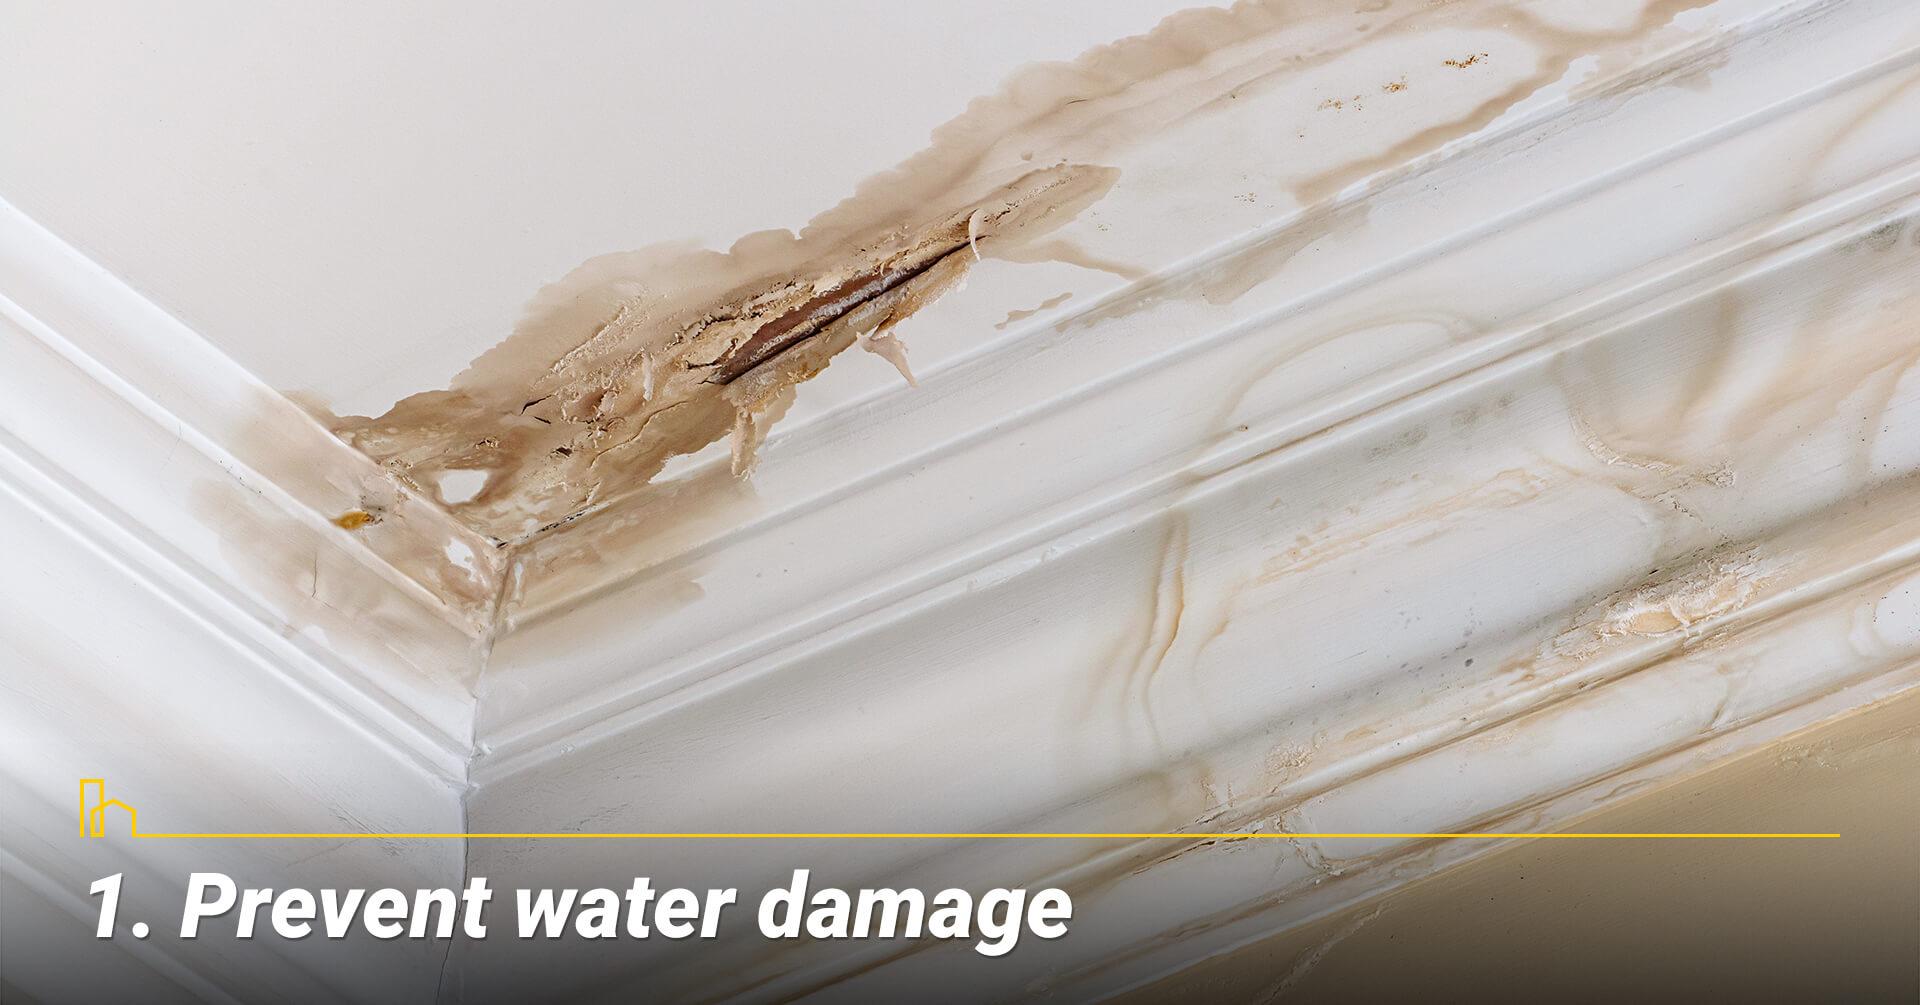 Prevent water damage, avoid interior water damage